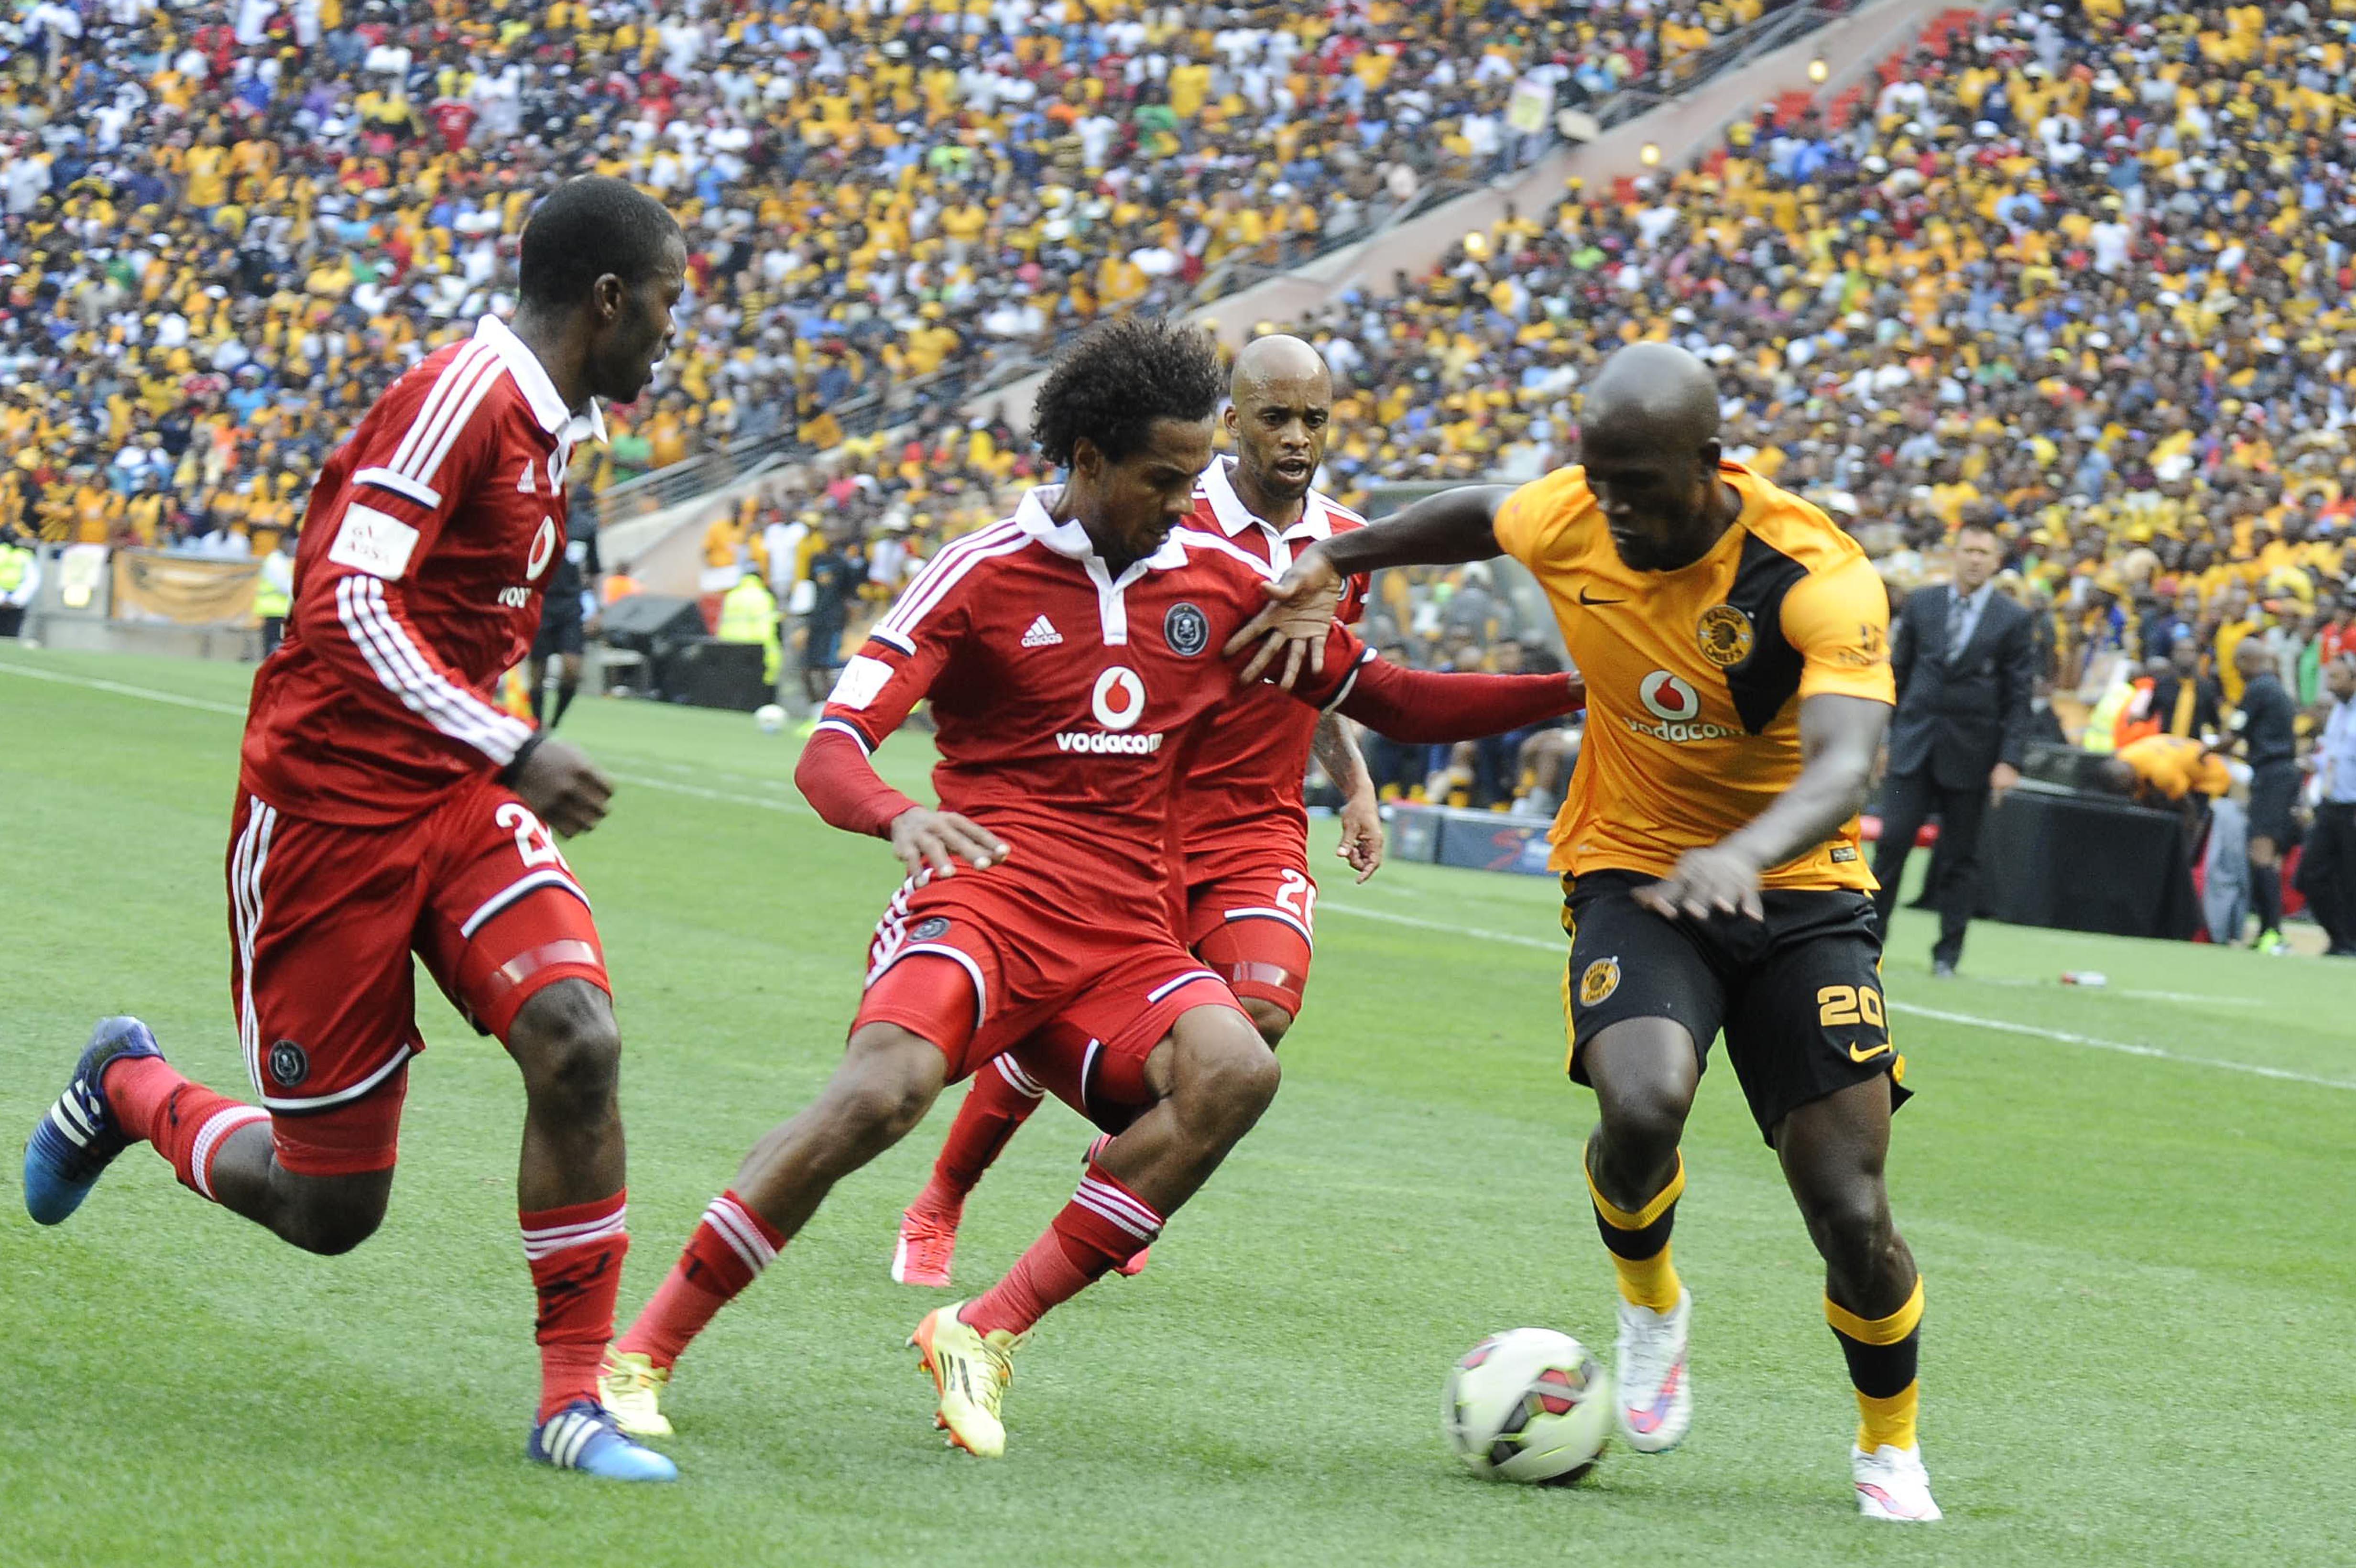 Kaizer Chiefs: Siphelele Mthembu, Kaizer Chiefs